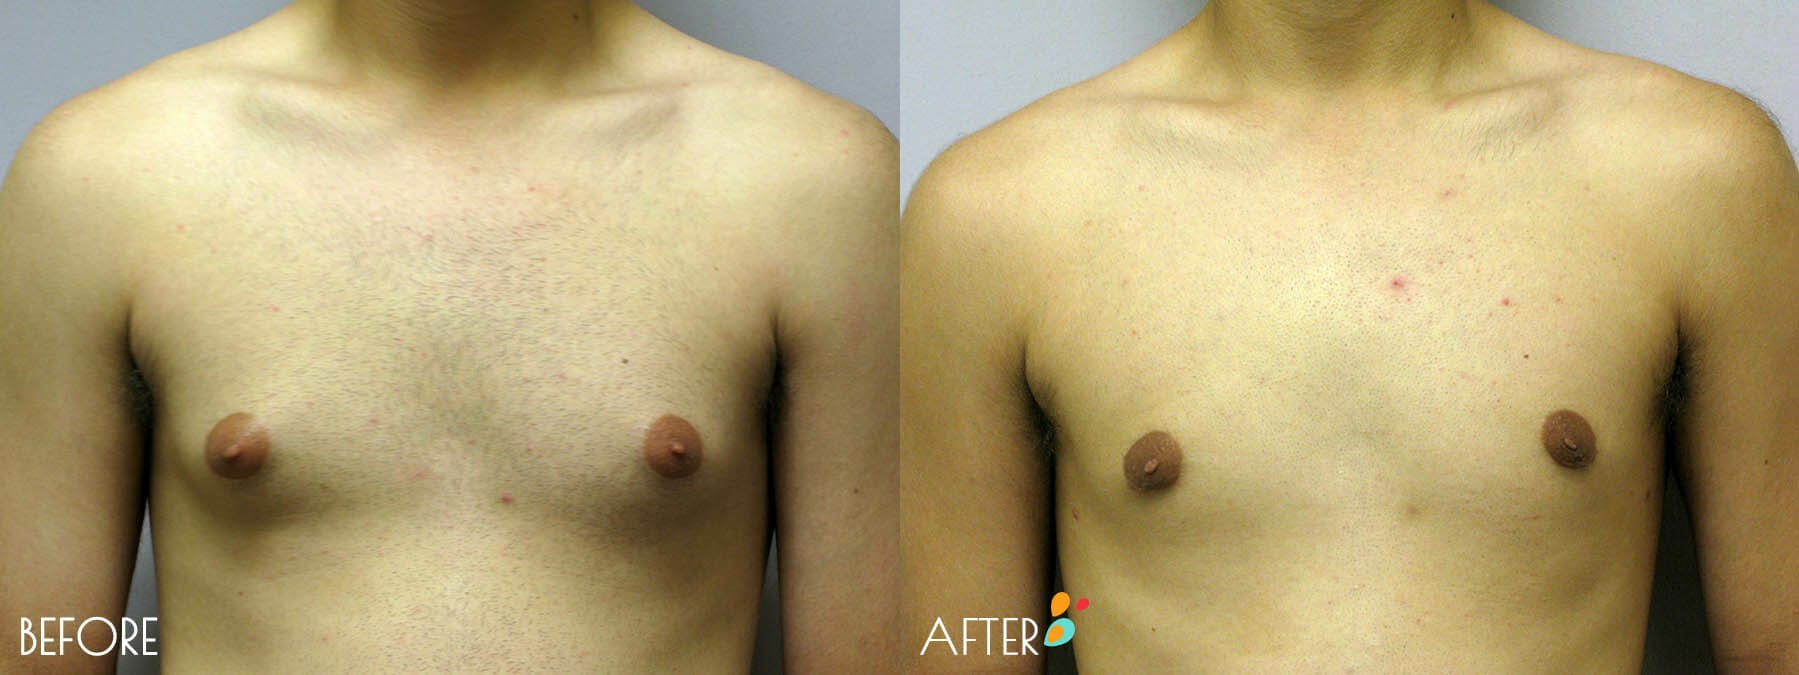 Gynecomastia Correction Patient 05, Front